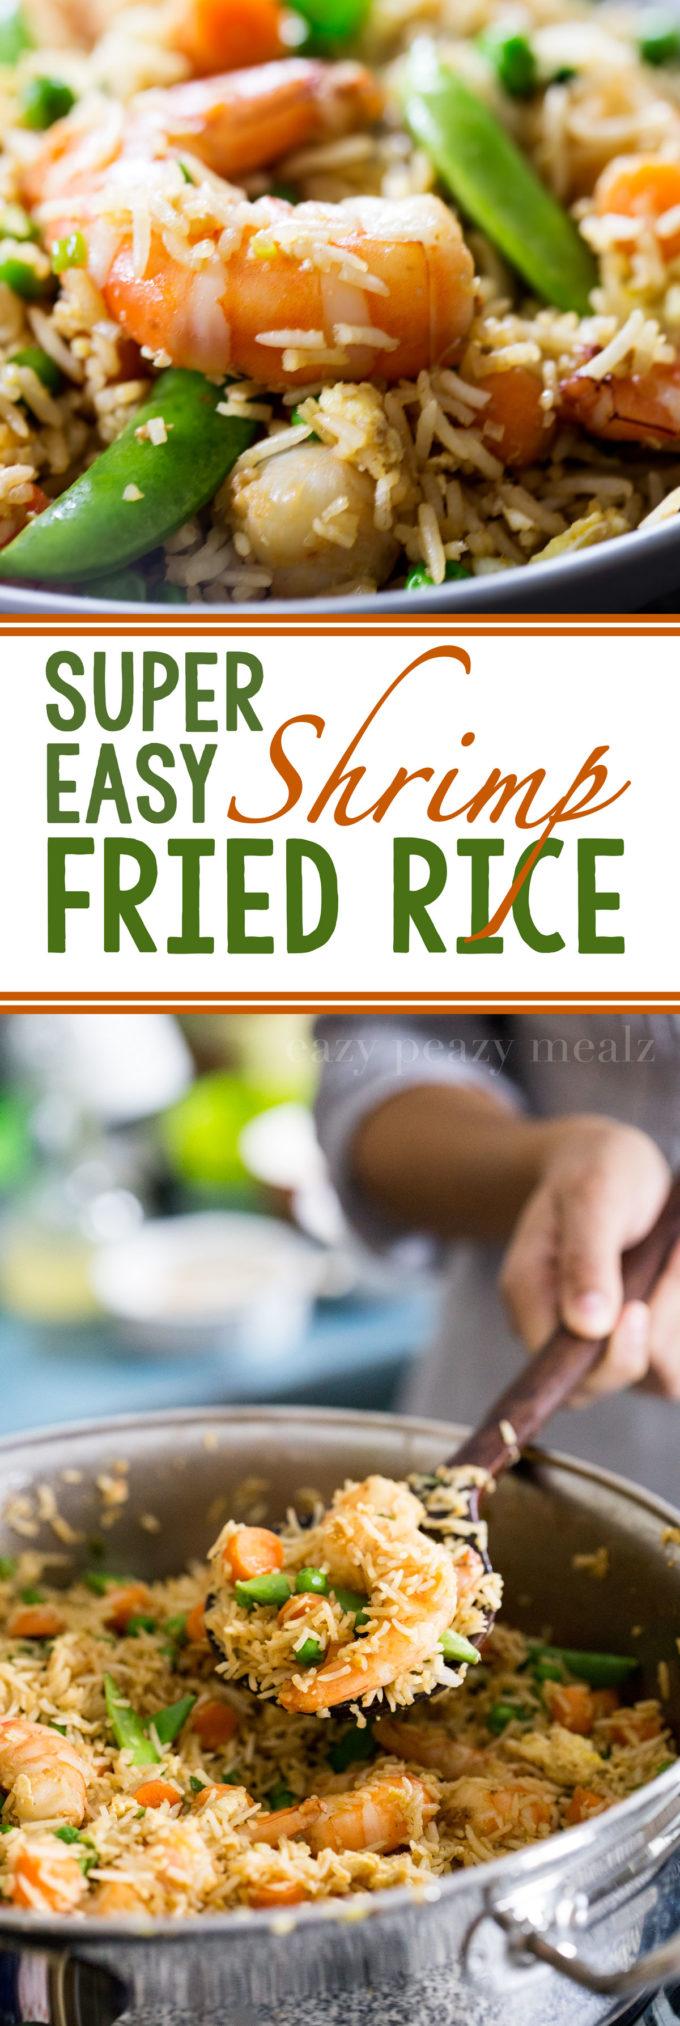 PIN-Super-easy-shrimp-fried-rice